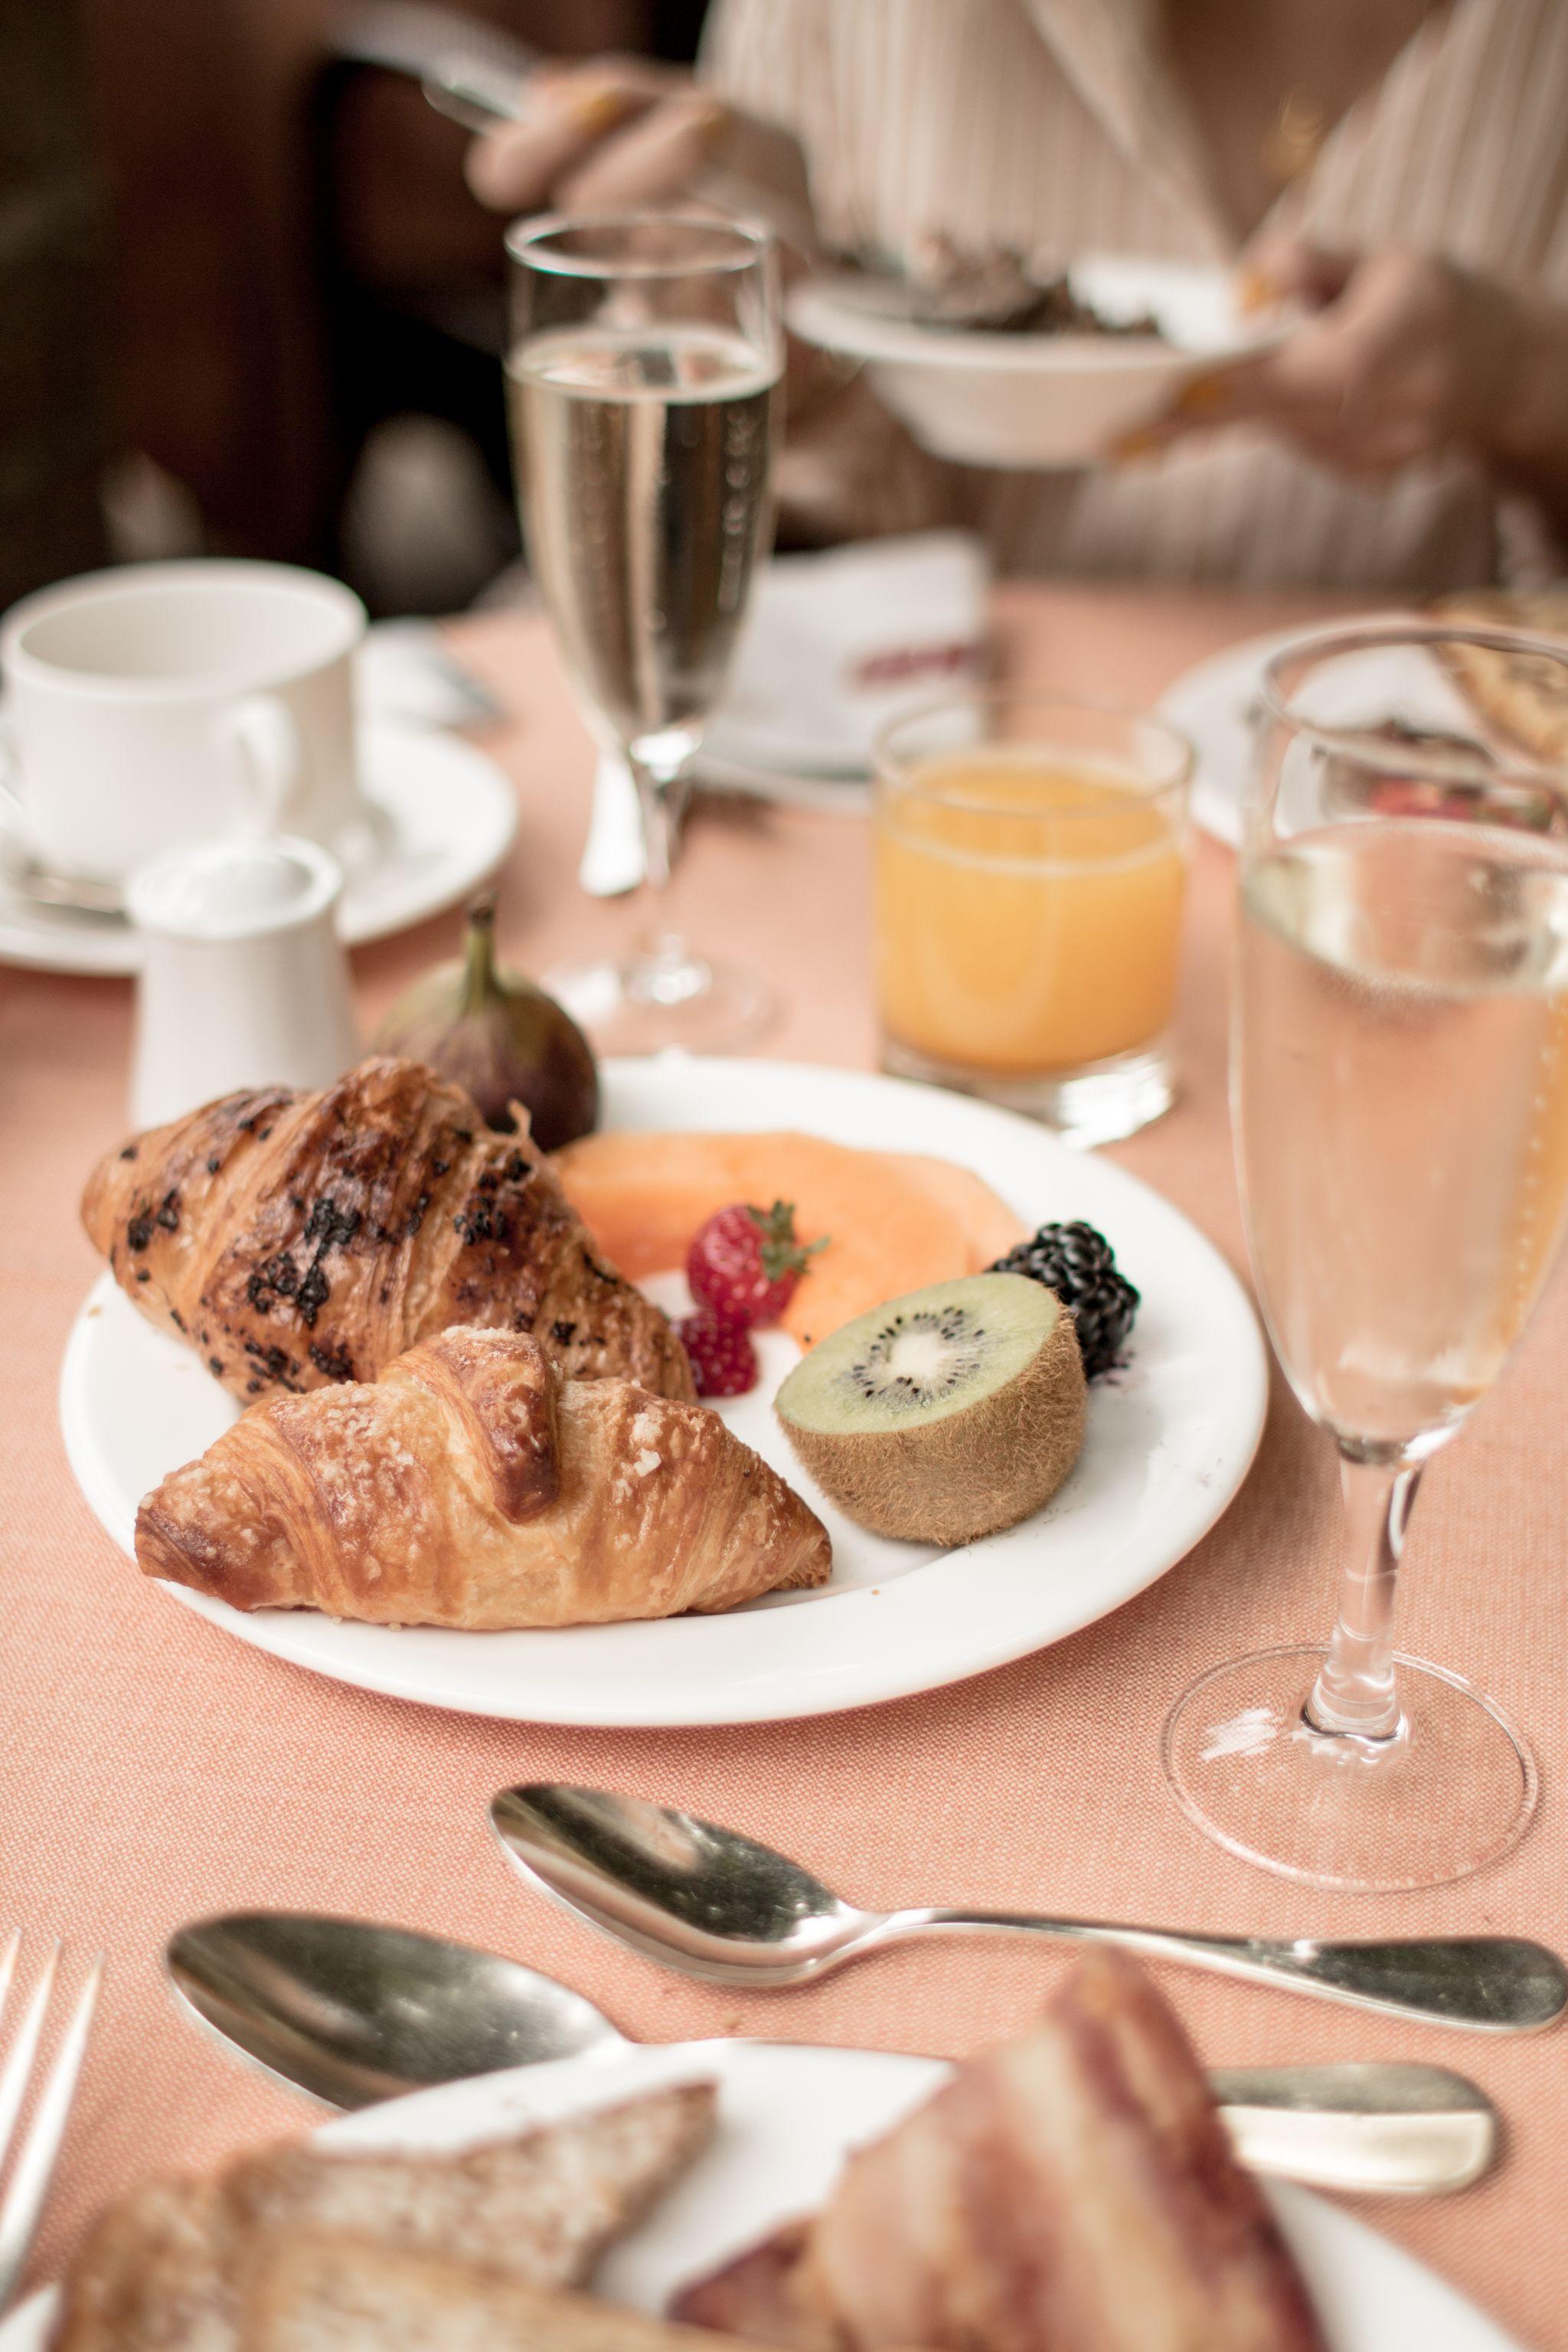 Adler Dolomites Hotel Ortisei Italy Hotel Review Italian Breakfast buffet